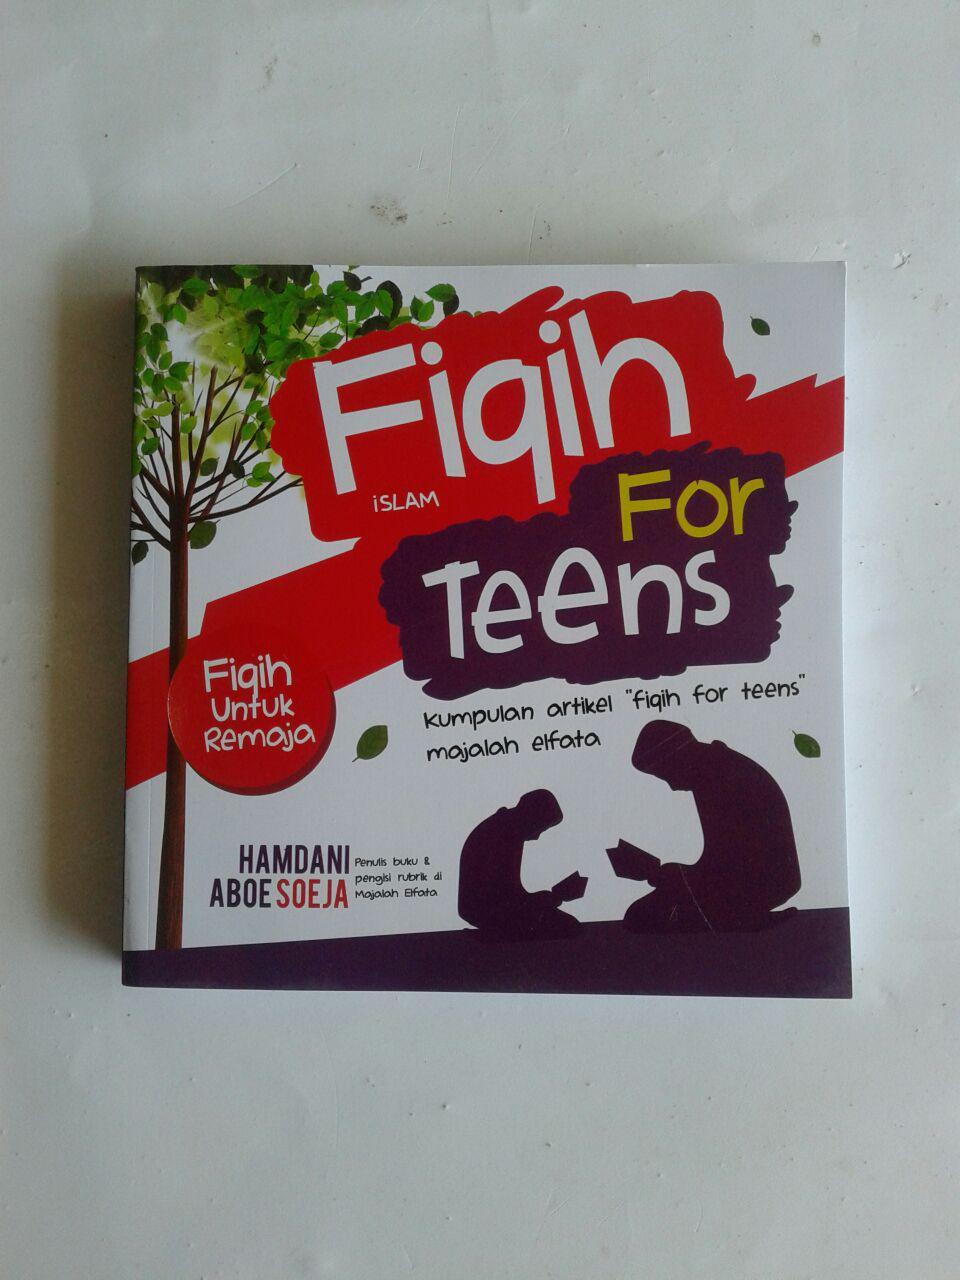 Buku Fiqih Islam For Teens Fiqih Untuk Remaja cover 2